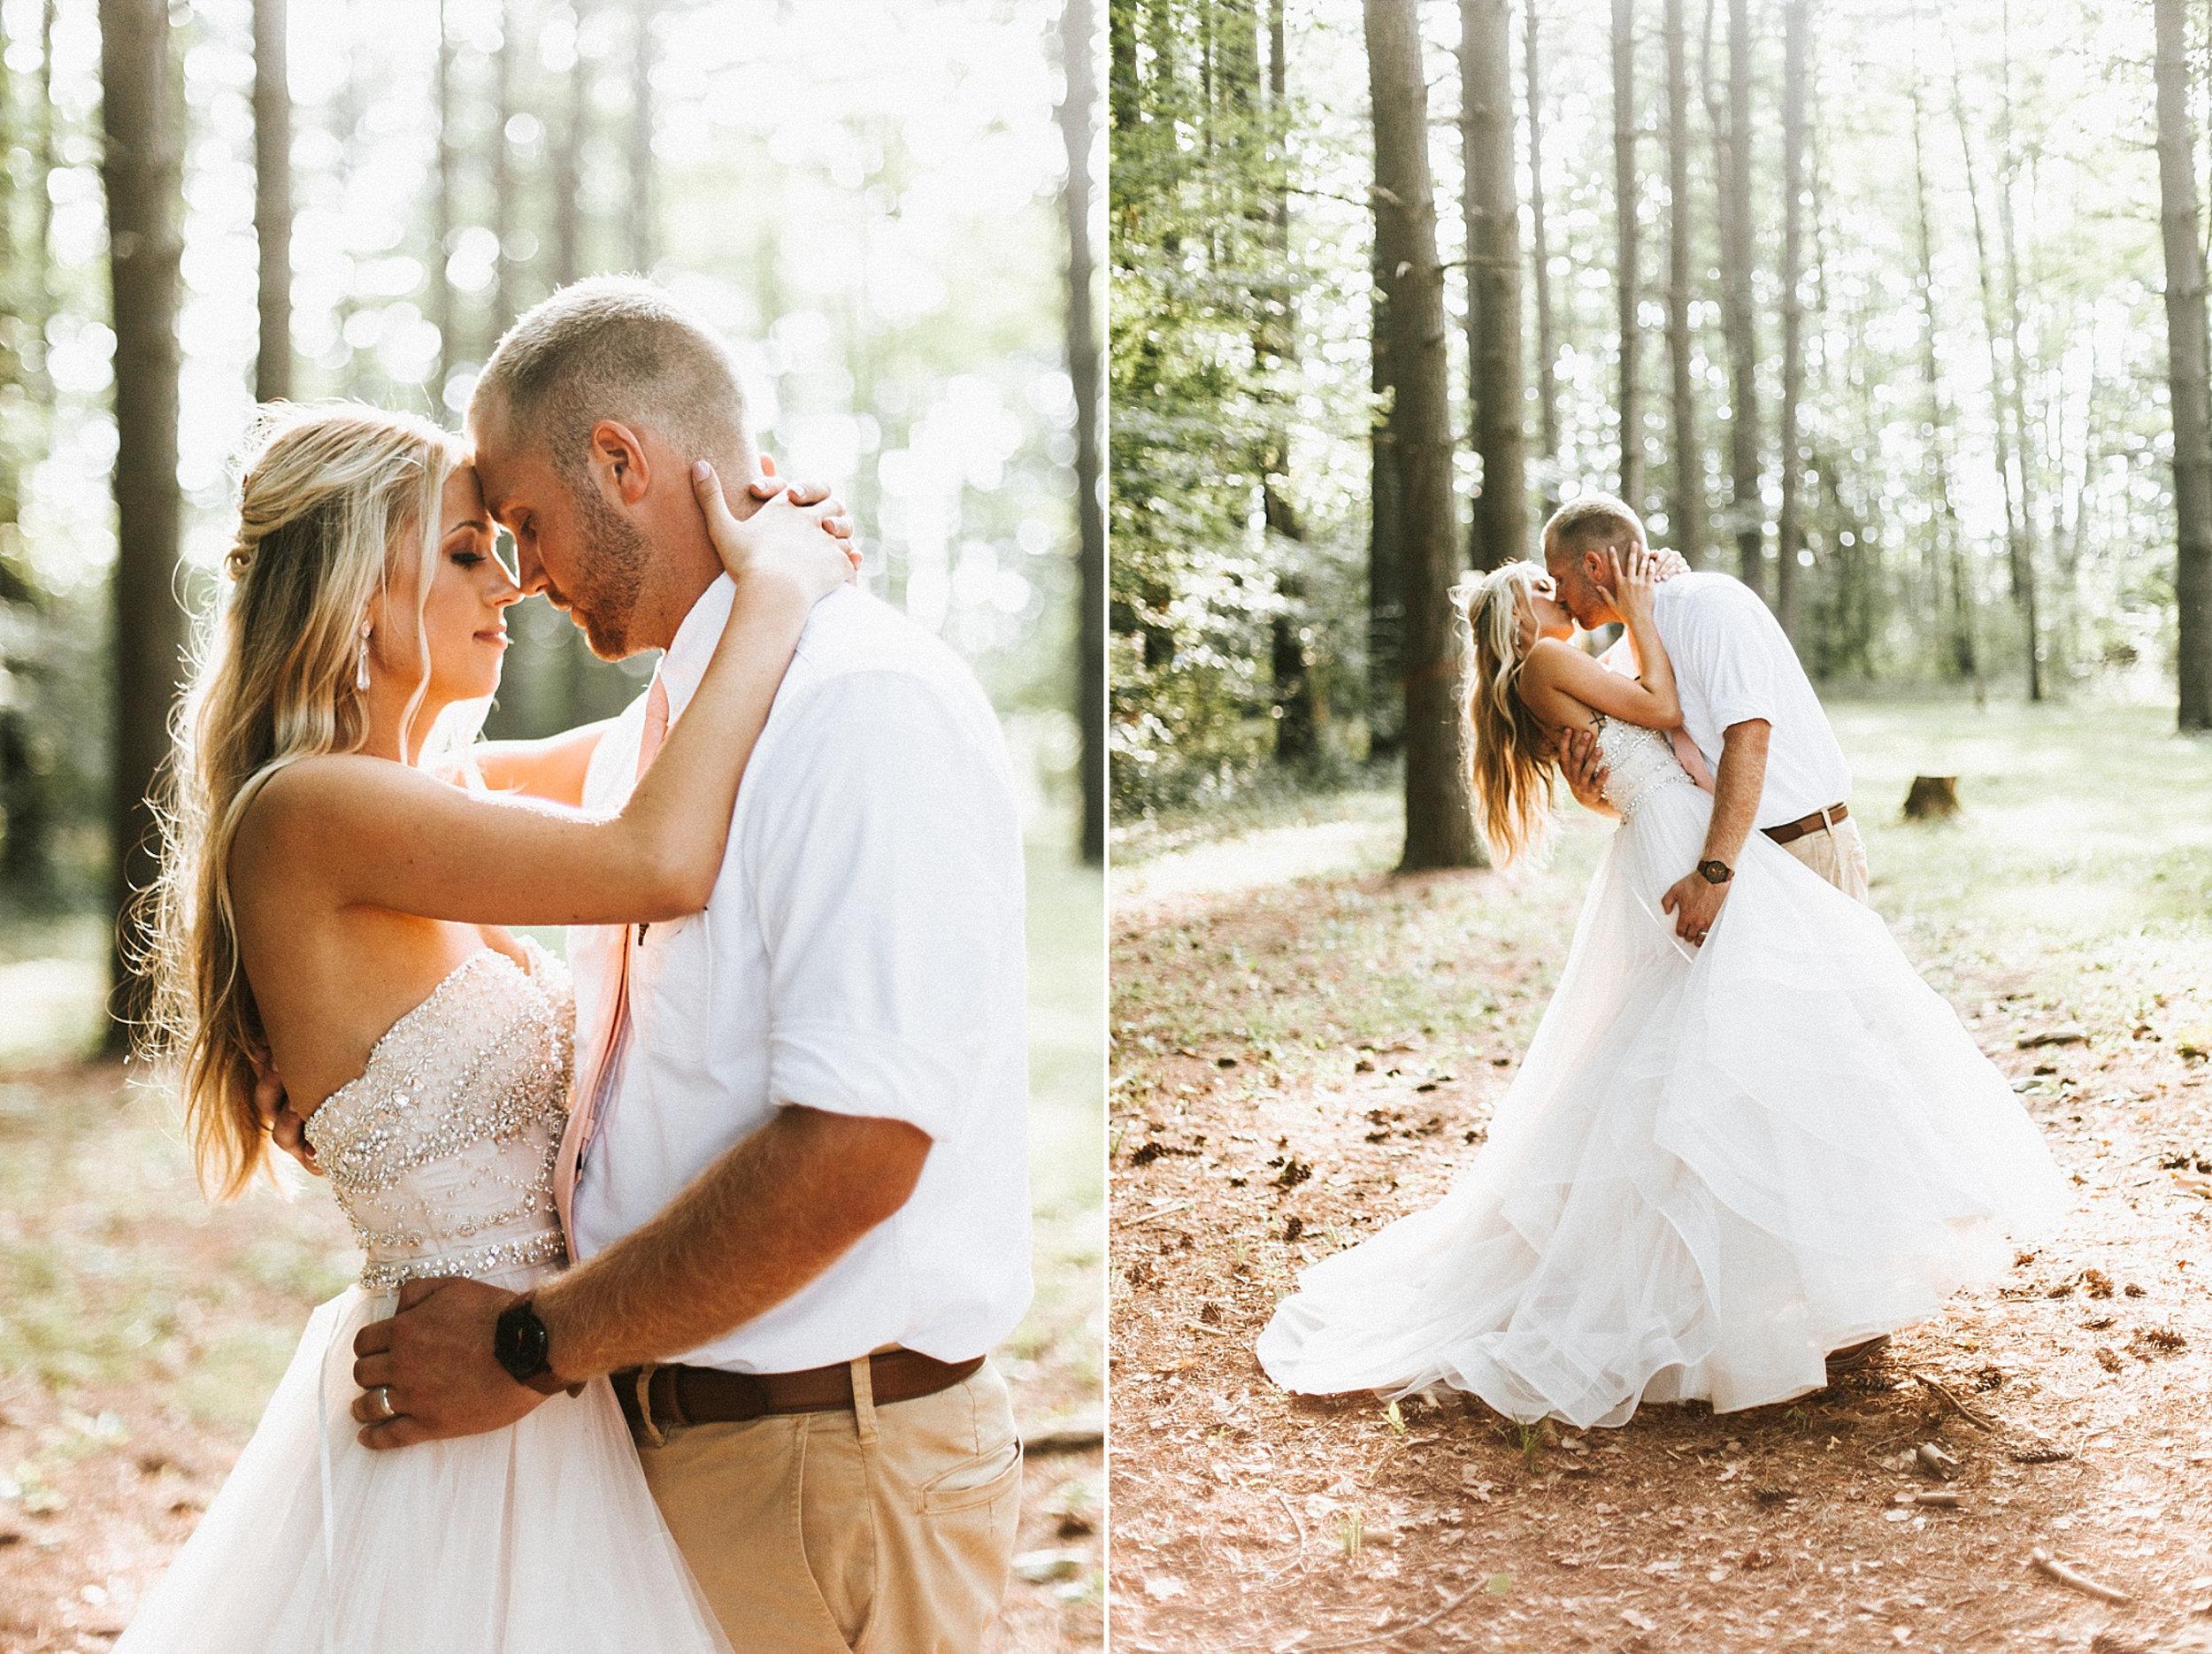 Brooke Townsend Photography - Cincinnati Wedding Photographer (117 of 153).jpg